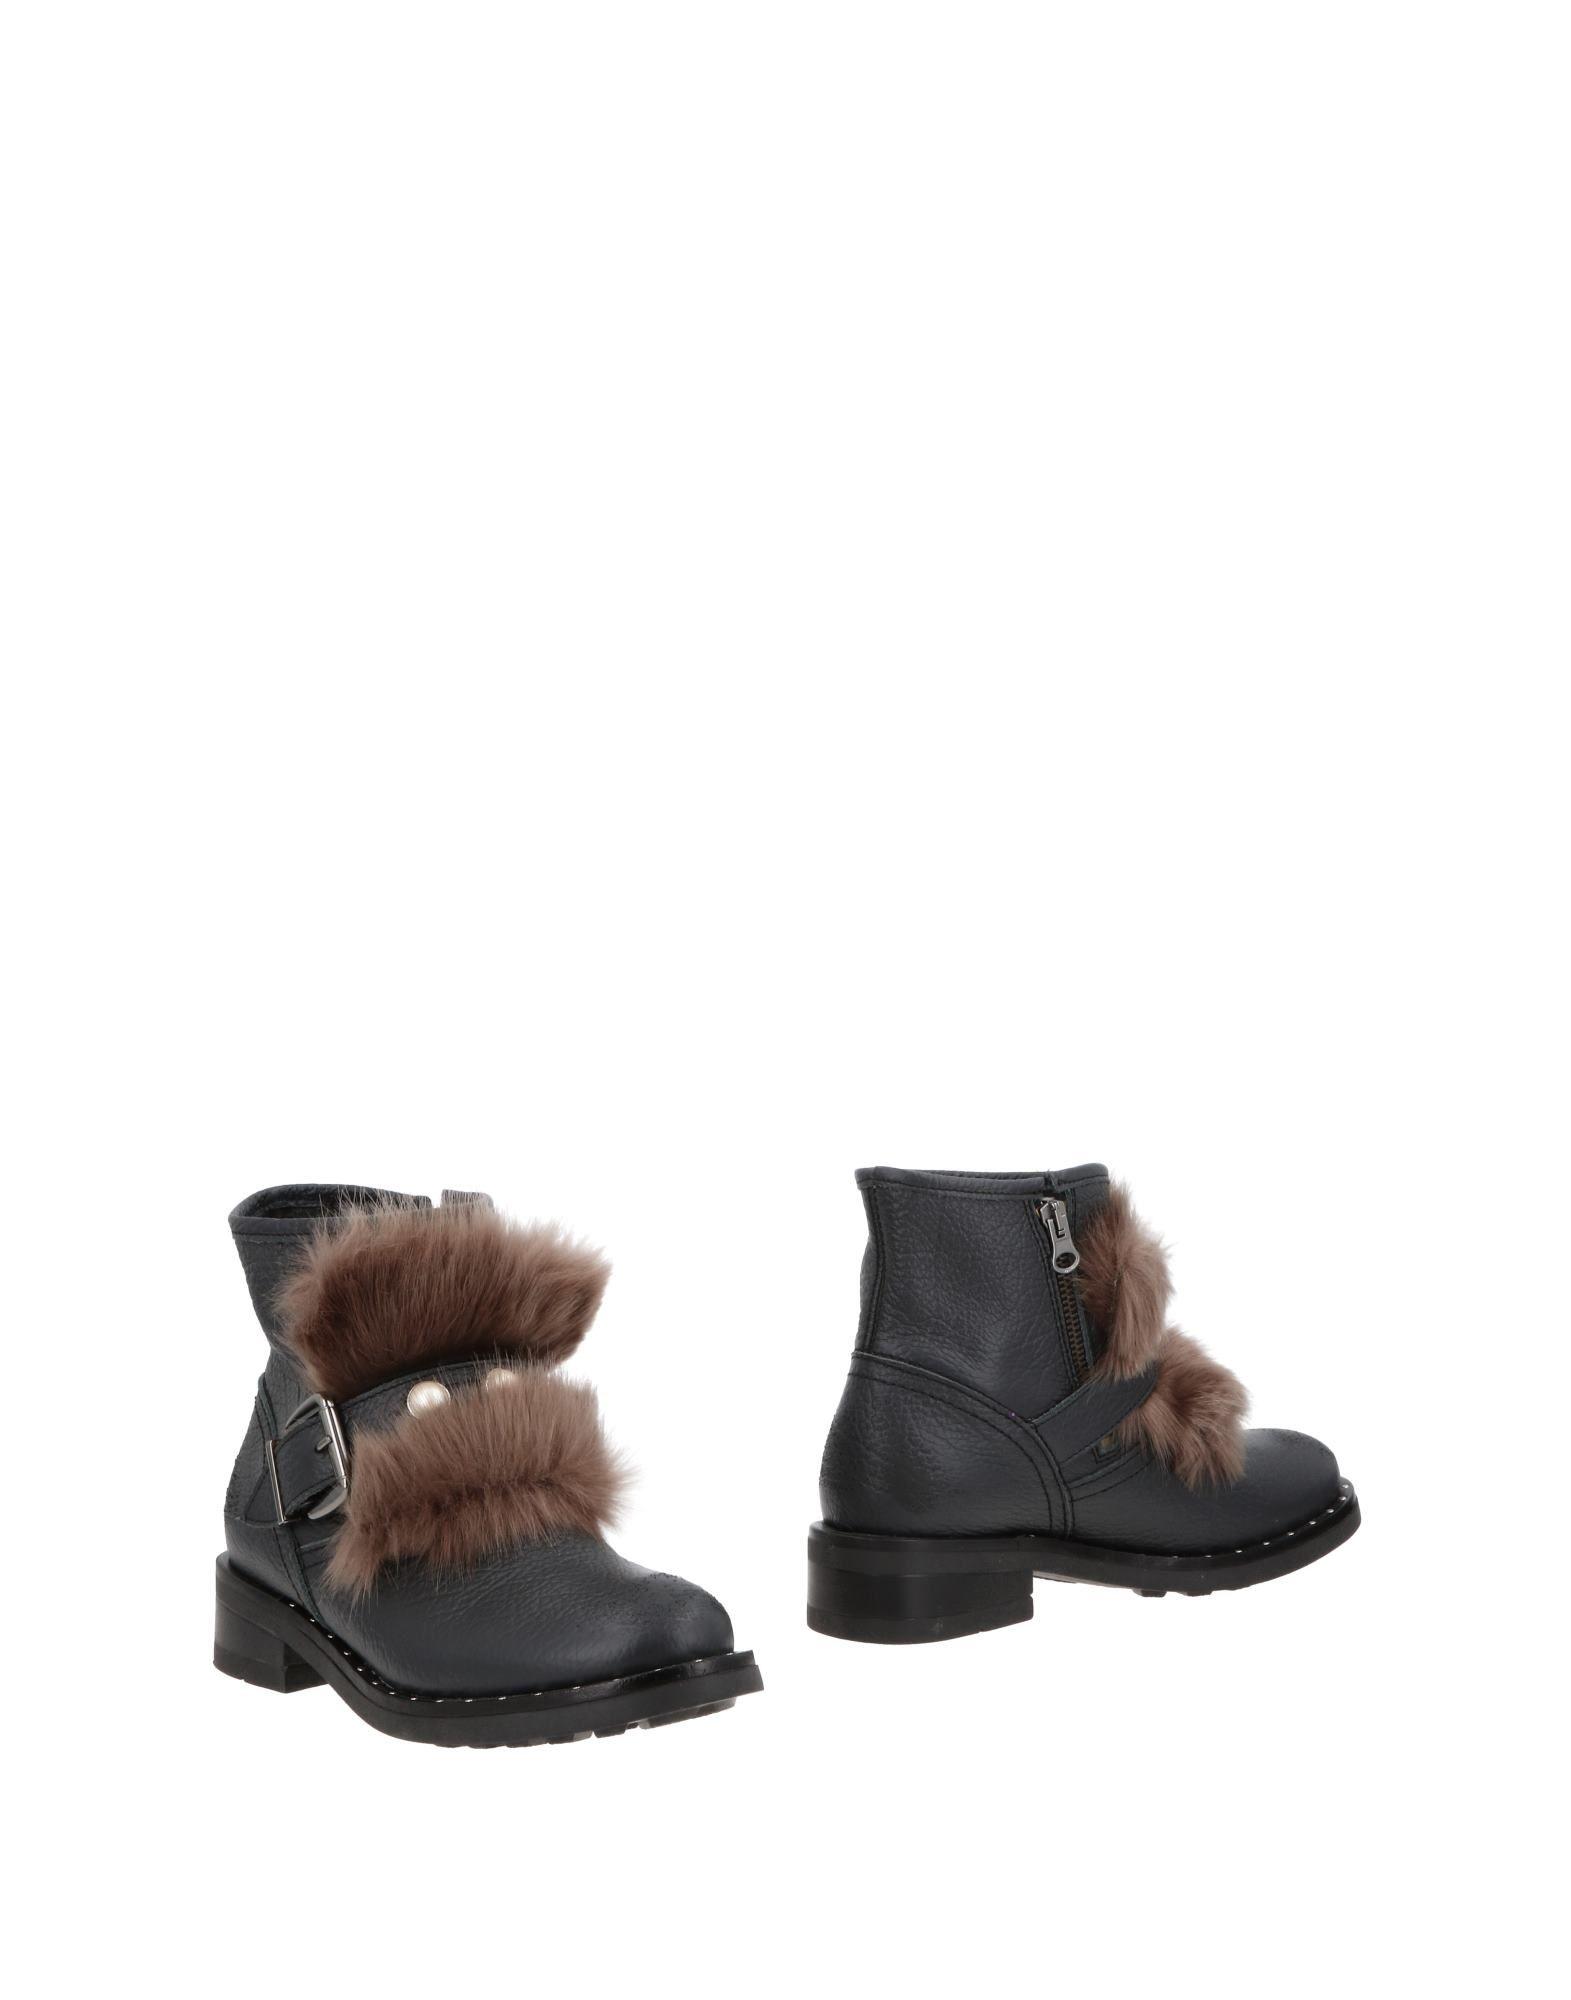 Penelope Stiefelette Damen beliebte  11496021MC Gute Qualität beliebte Damen Schuhe f4e906